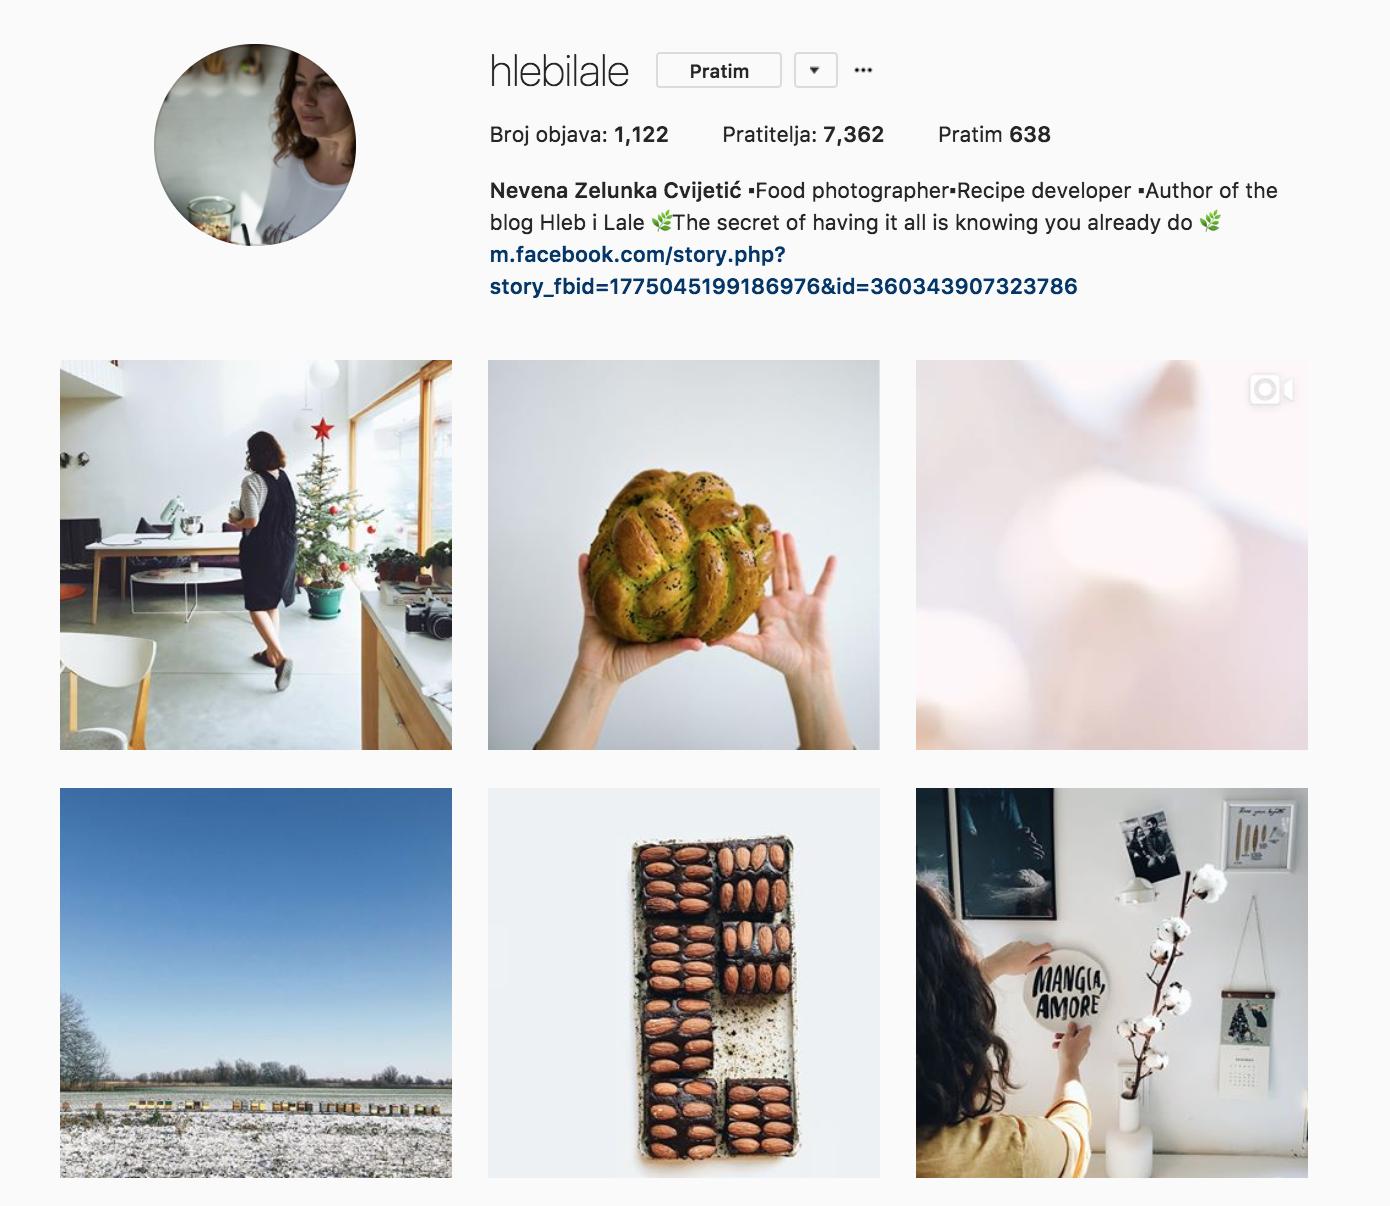 hleb i lale instagram